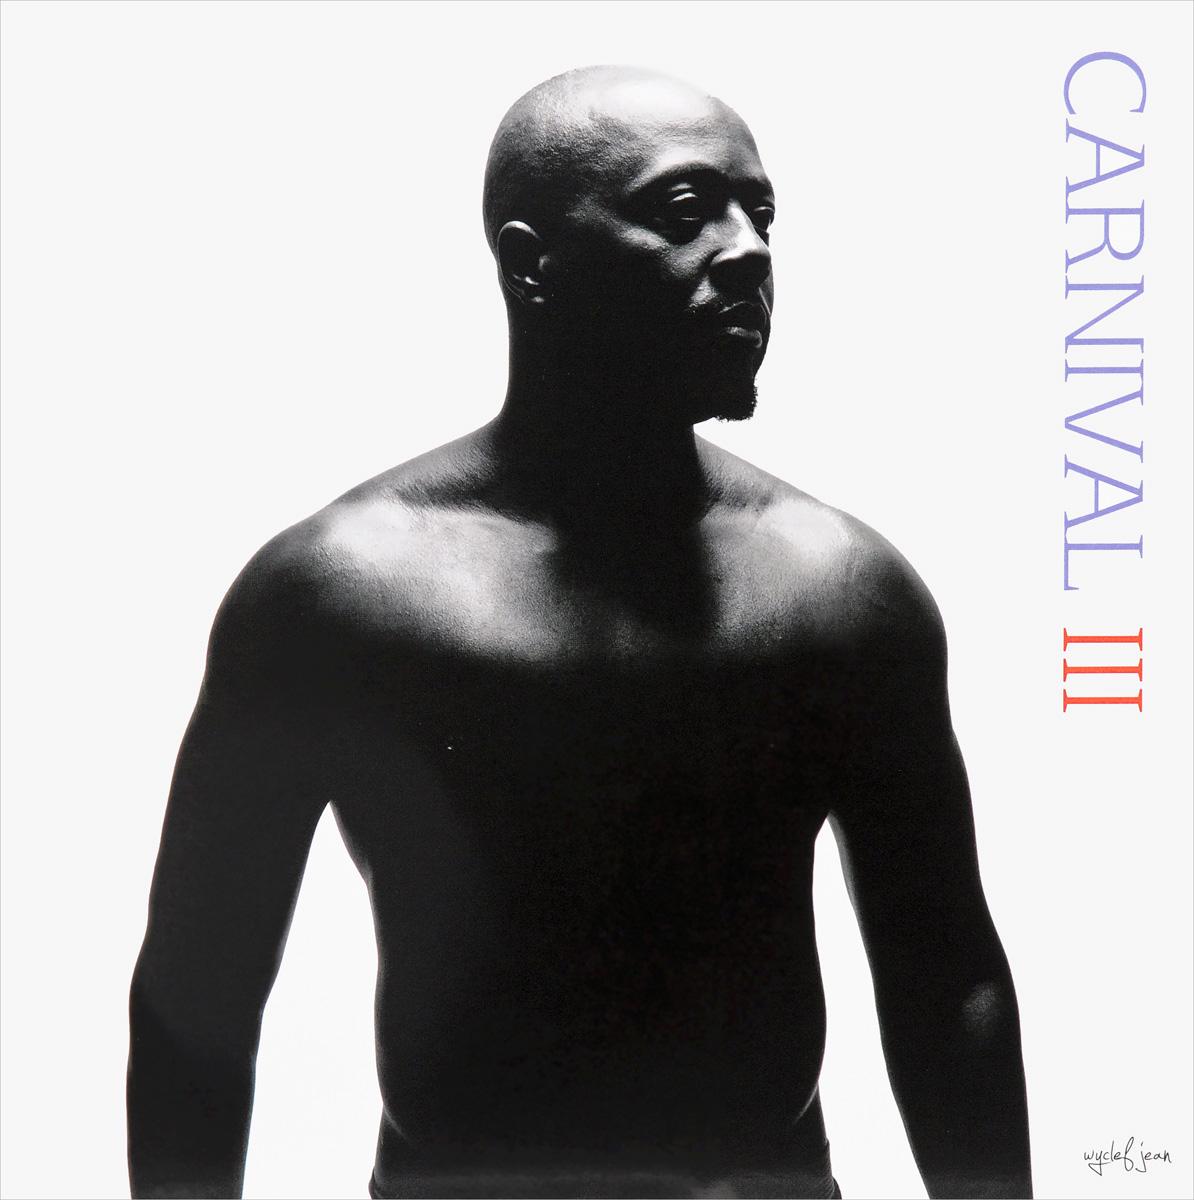 Уайклеф Джин Wyclef Jean. Carnival III: The Fall And Rise Of A Refugee (LP)